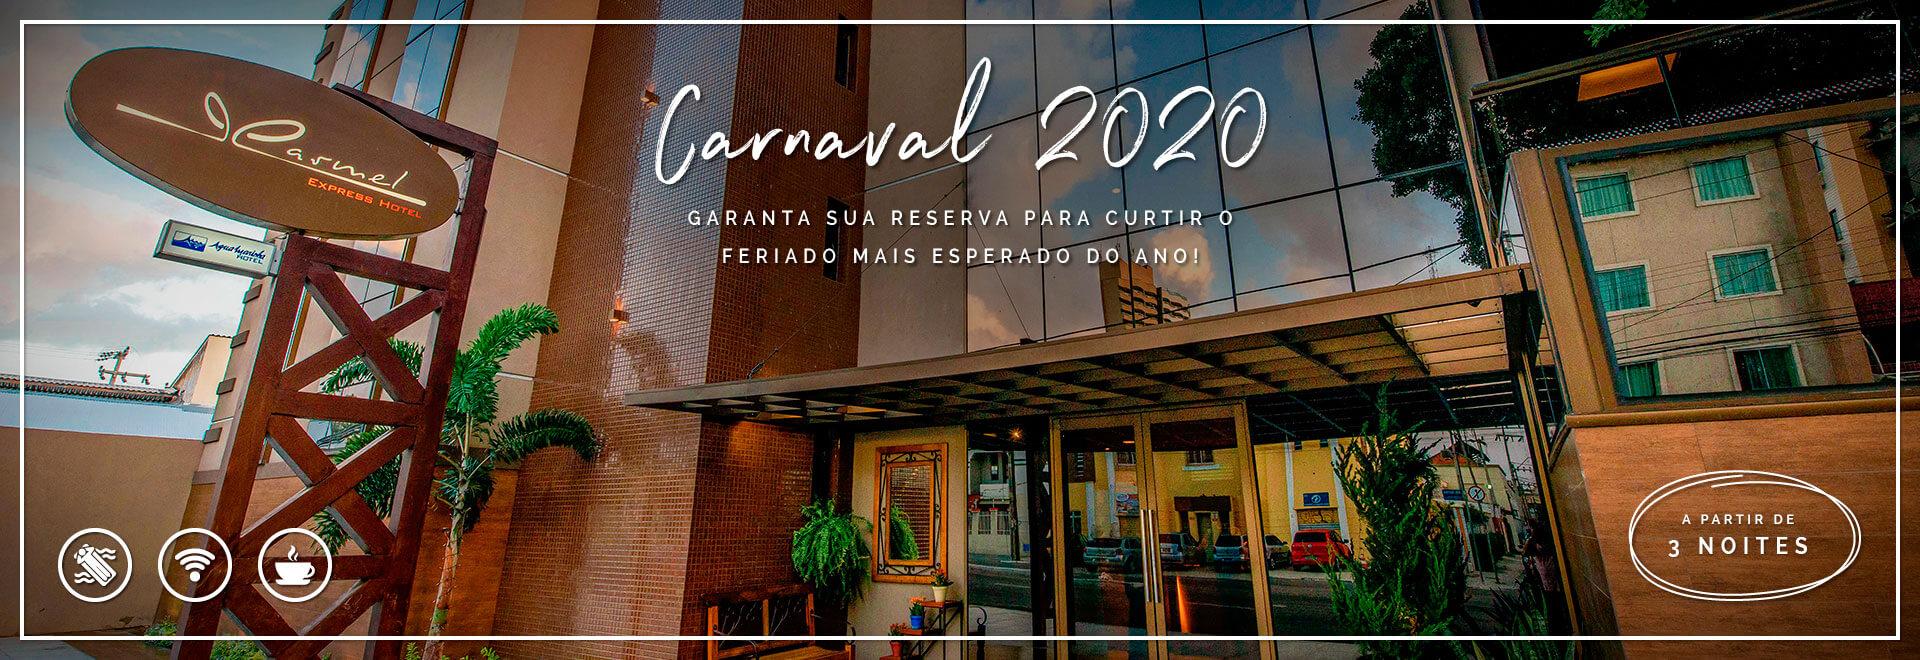 CARNAVAL 2020 02